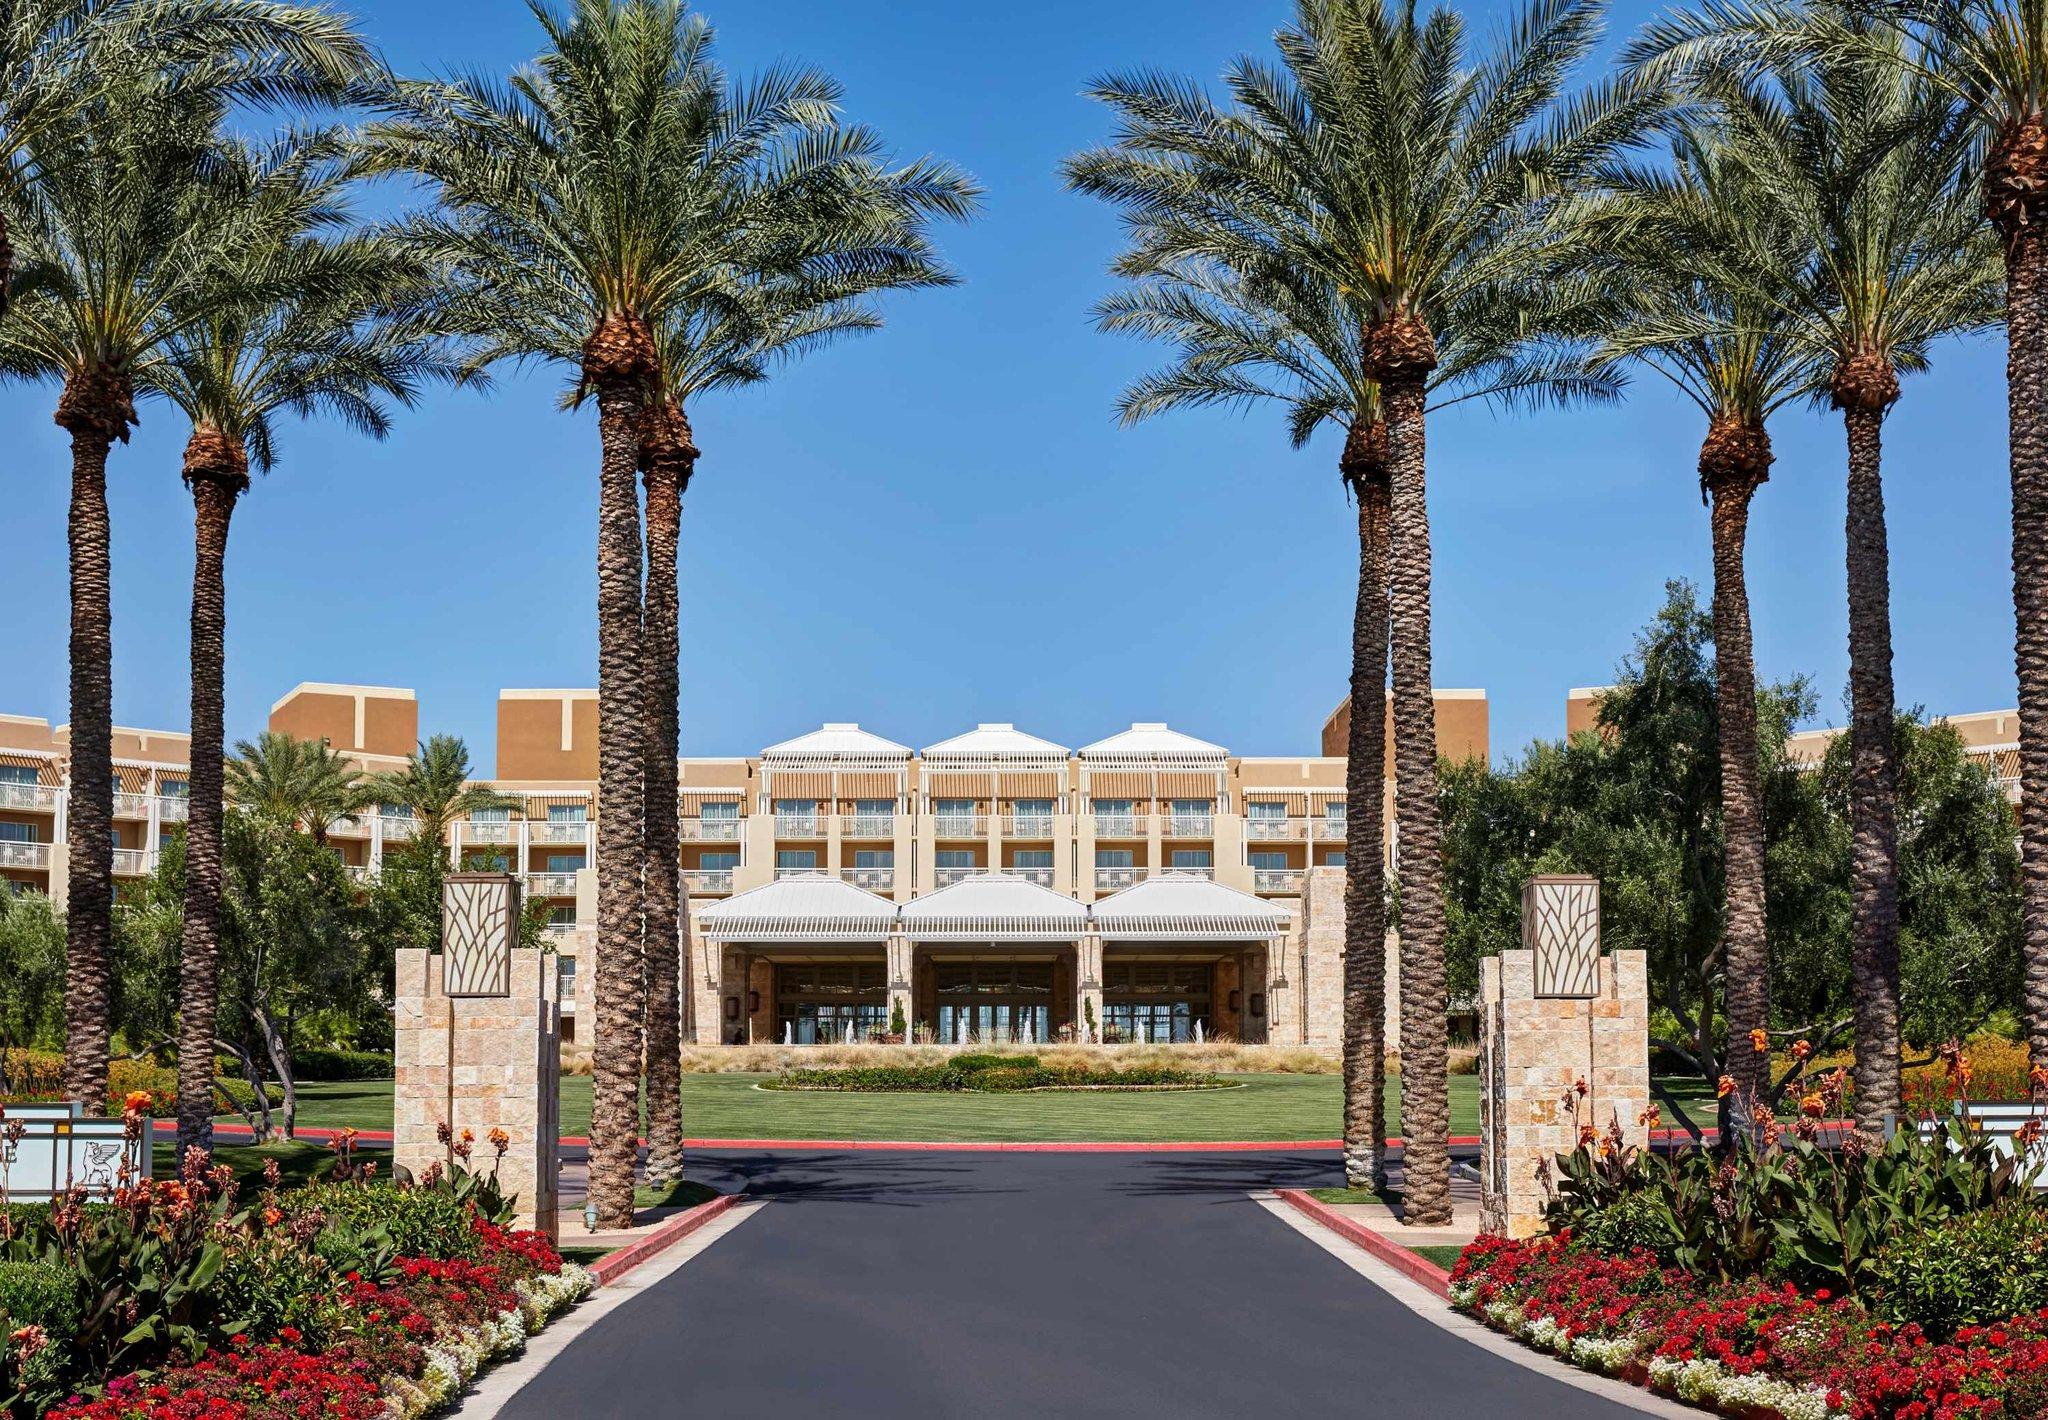 Meetings  Events at JW Marriott Phoenix Desert Ridge Resort  Spa